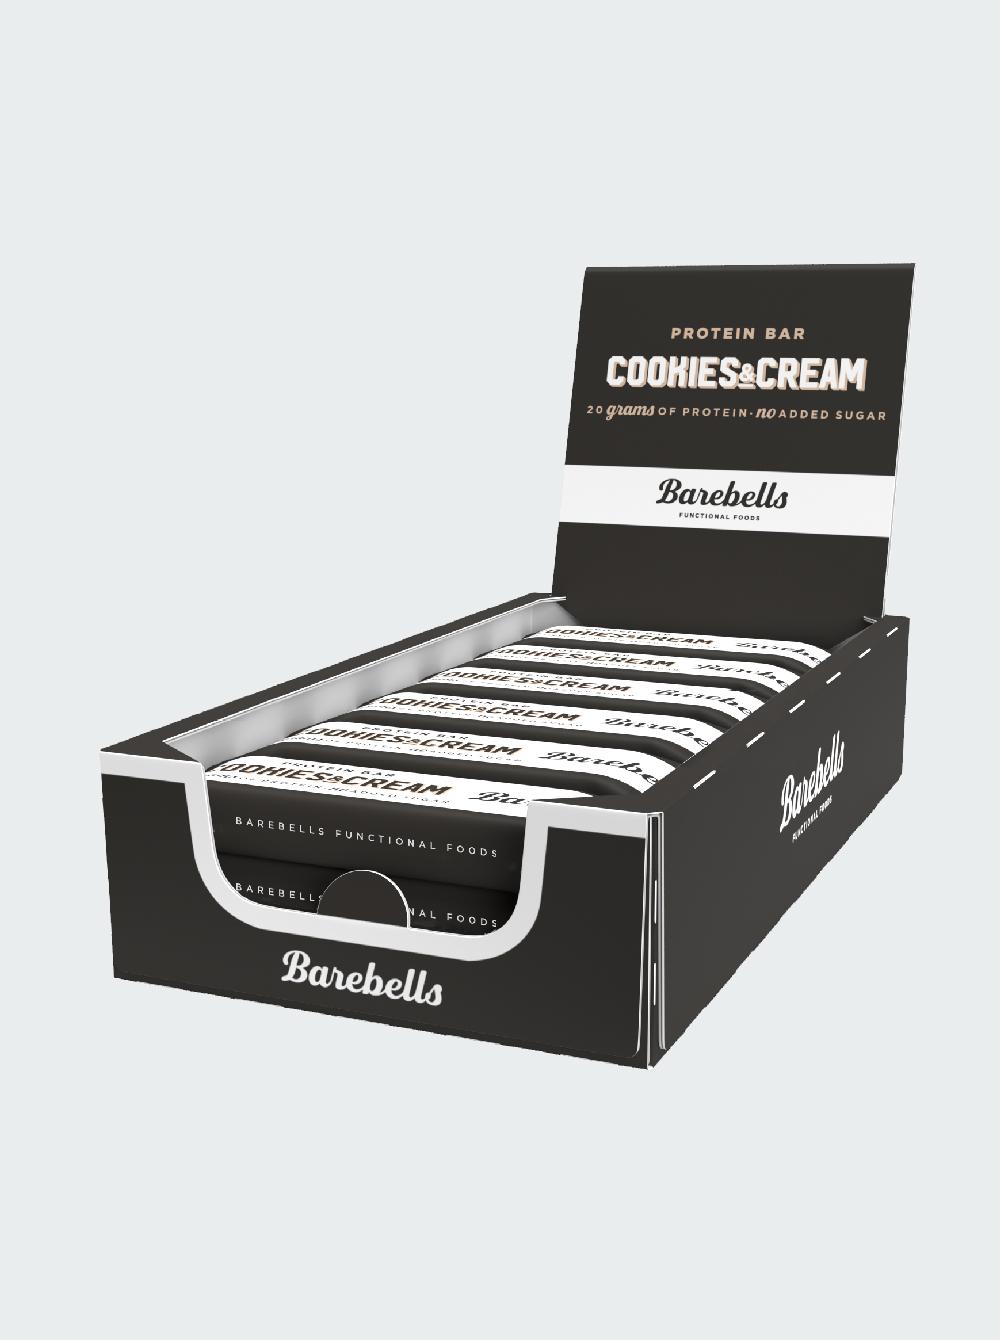 Barebells Cookies & Cream 12-pack